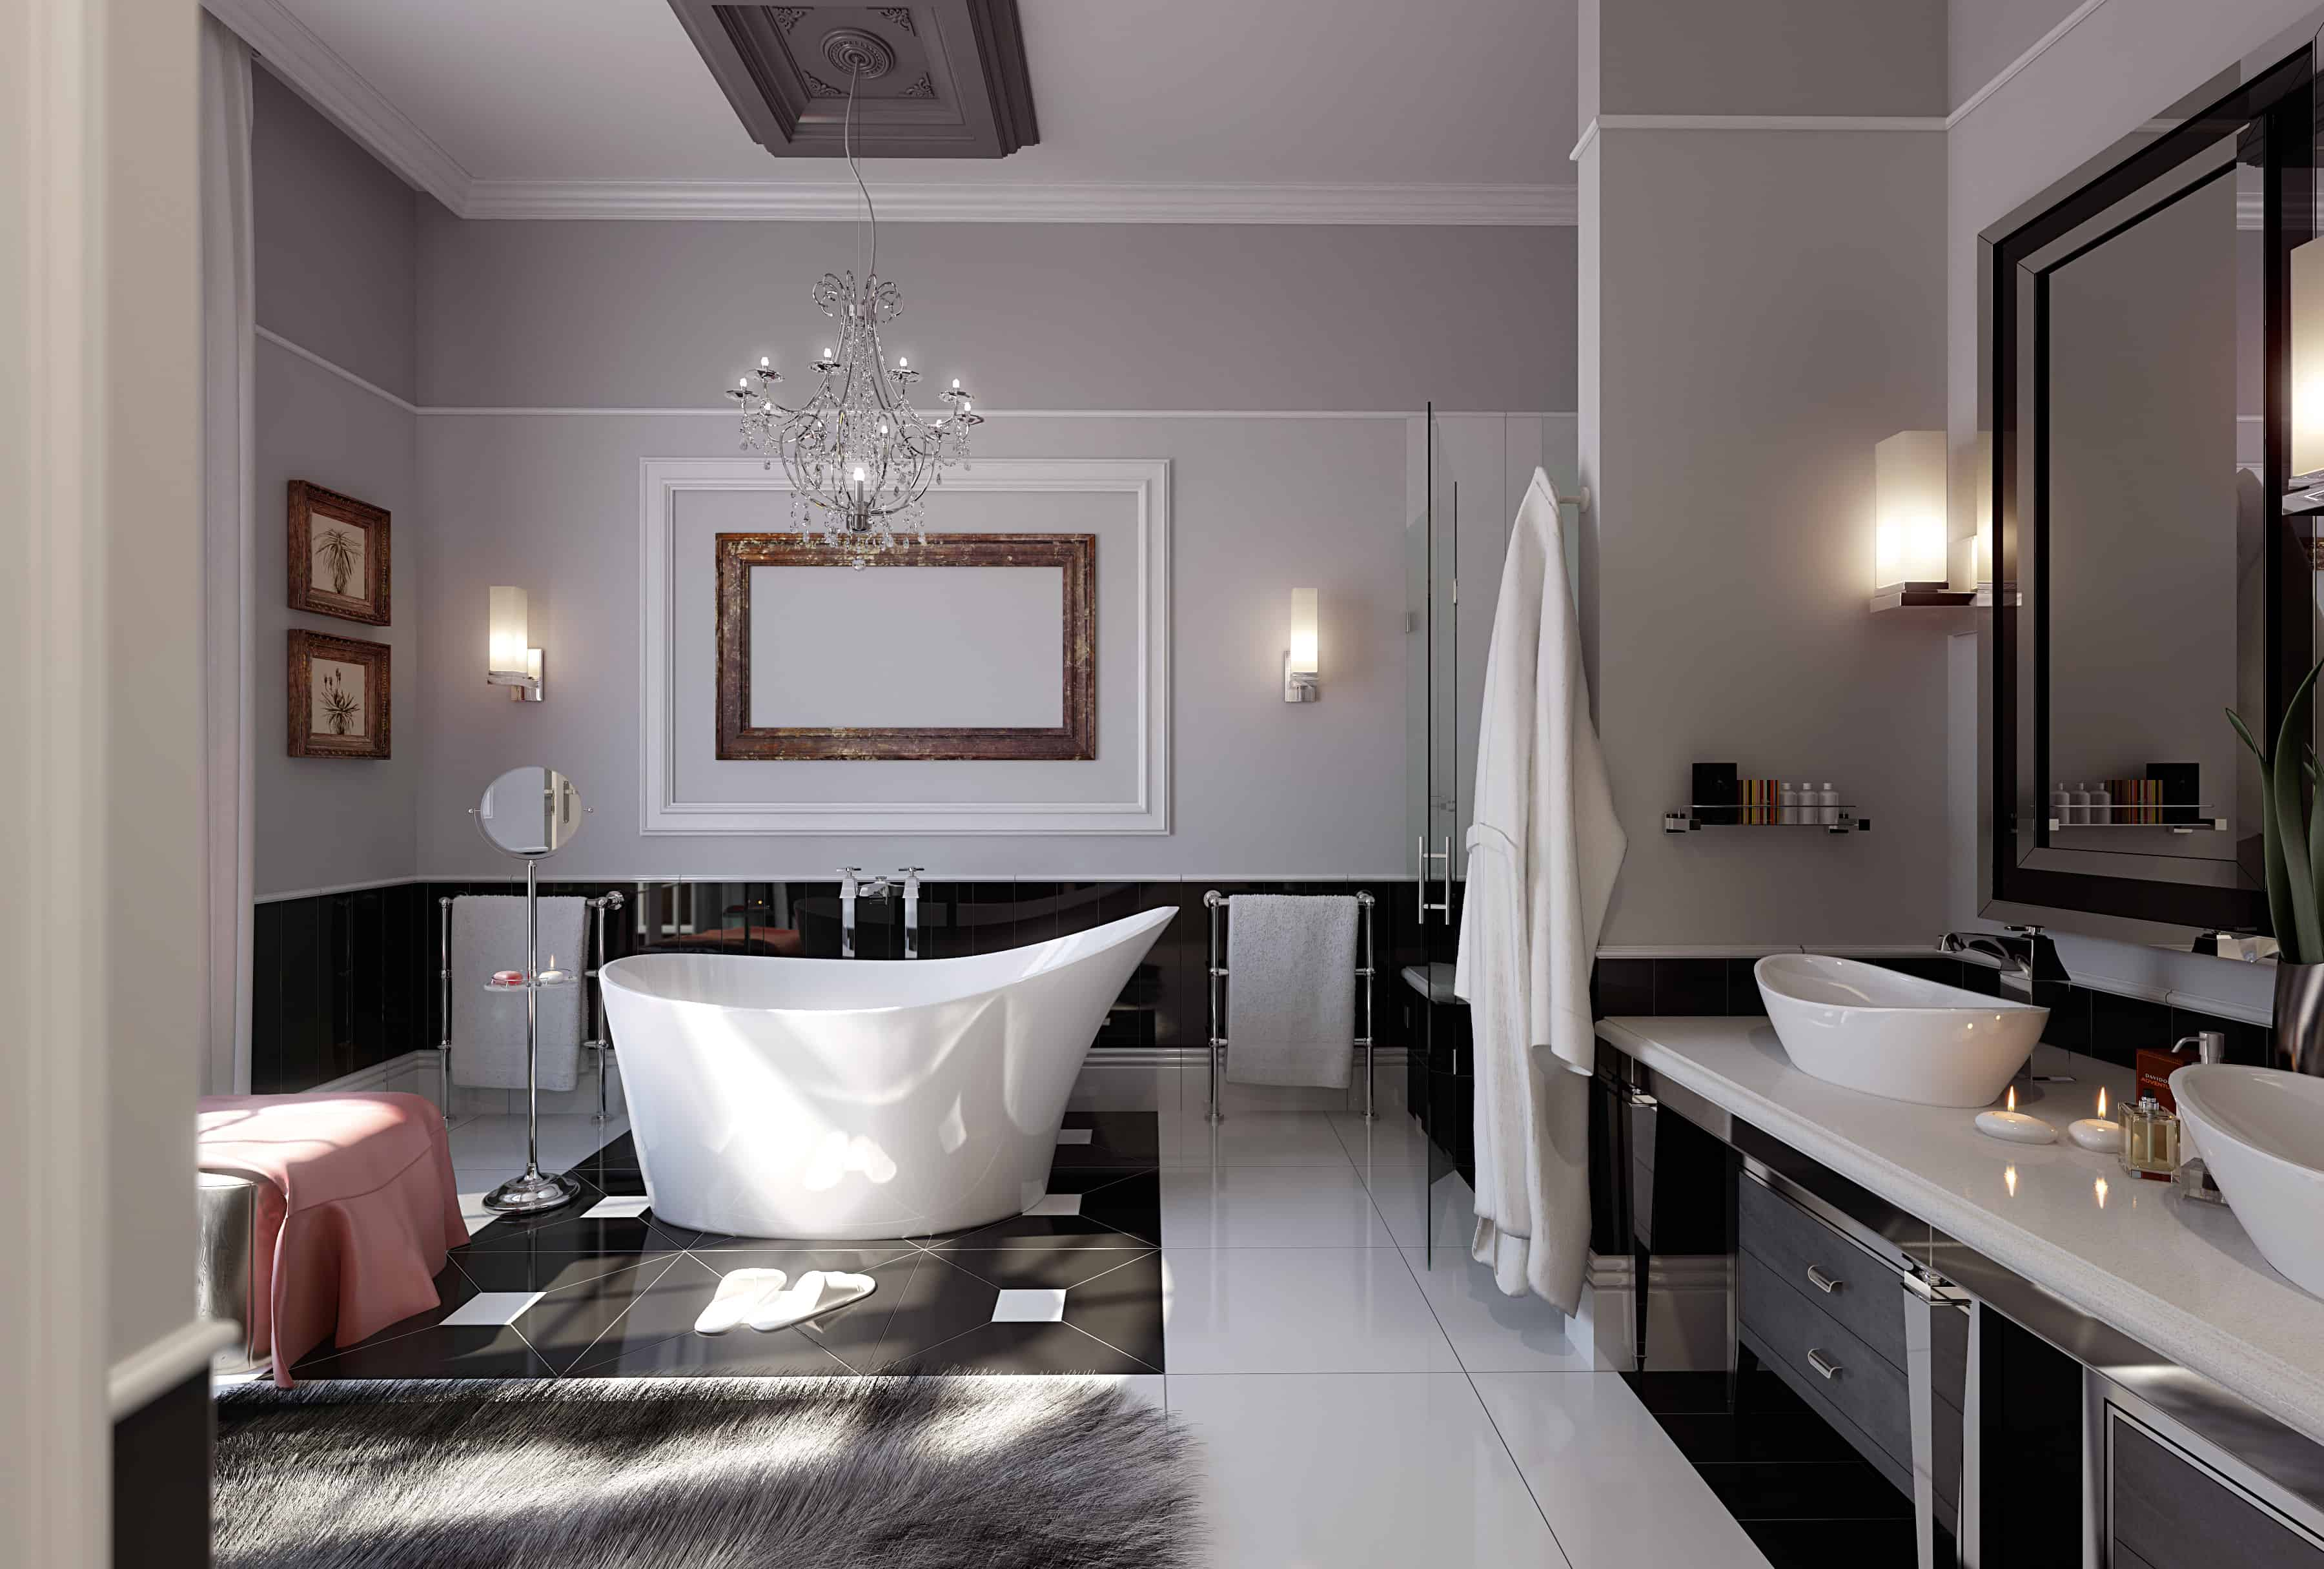 cozy bathroom.jpg 2